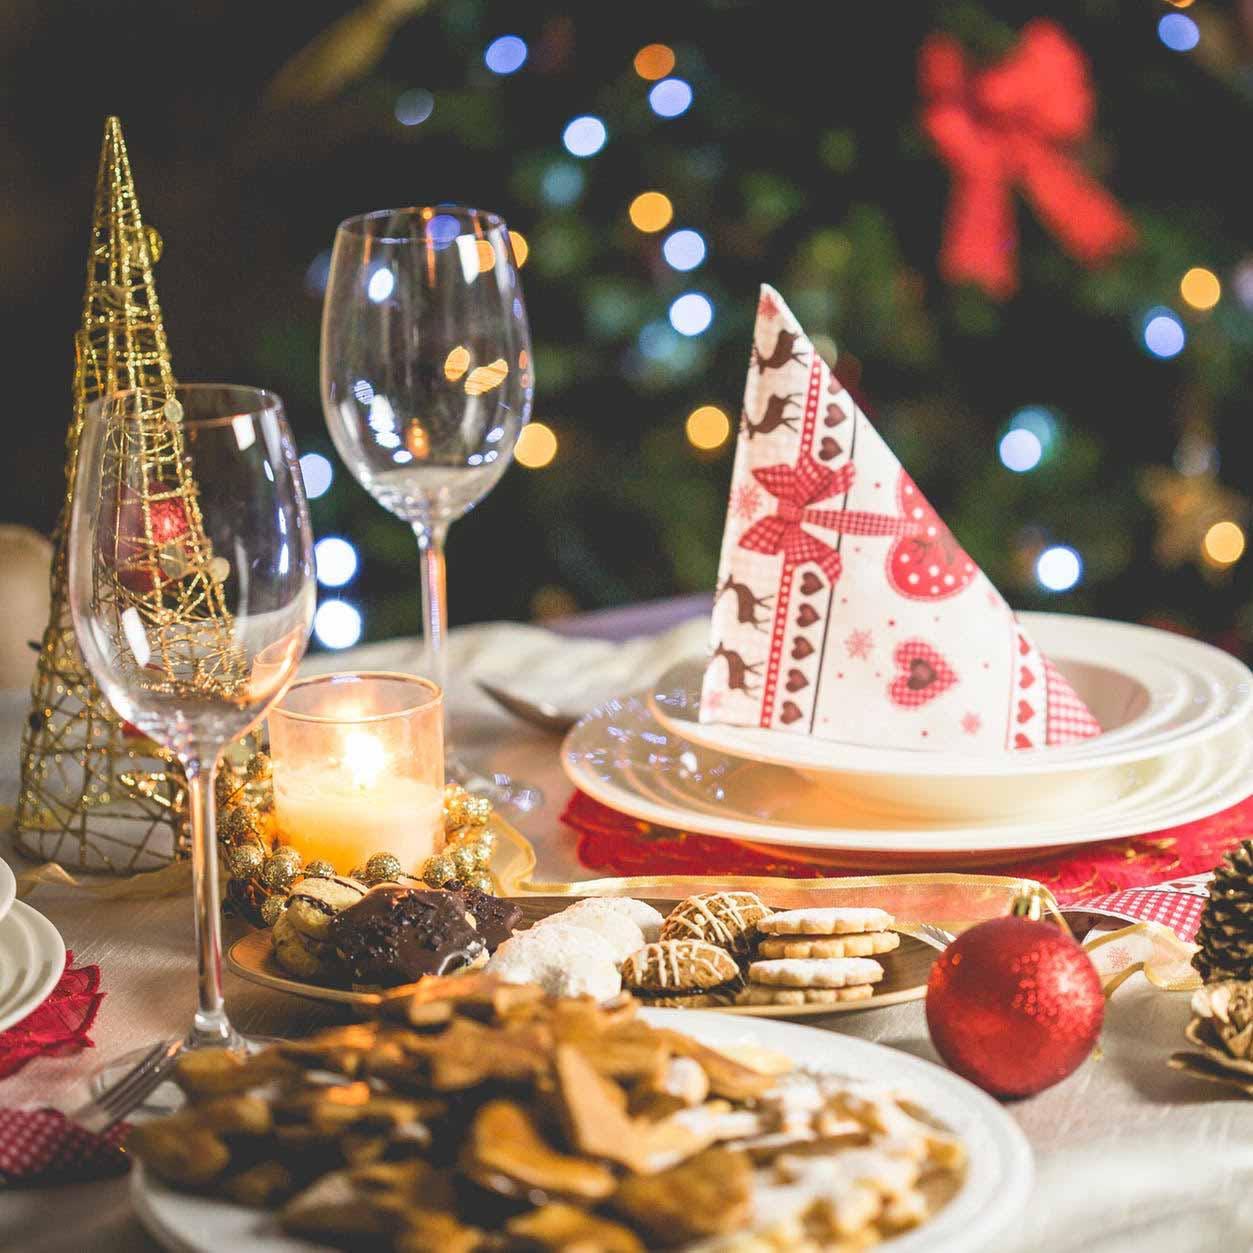 Christmas decoration,Christmas eve,Christmas,Christmas tree,Table,Cuisine,Event,Food,Christmas dinner,Party hat